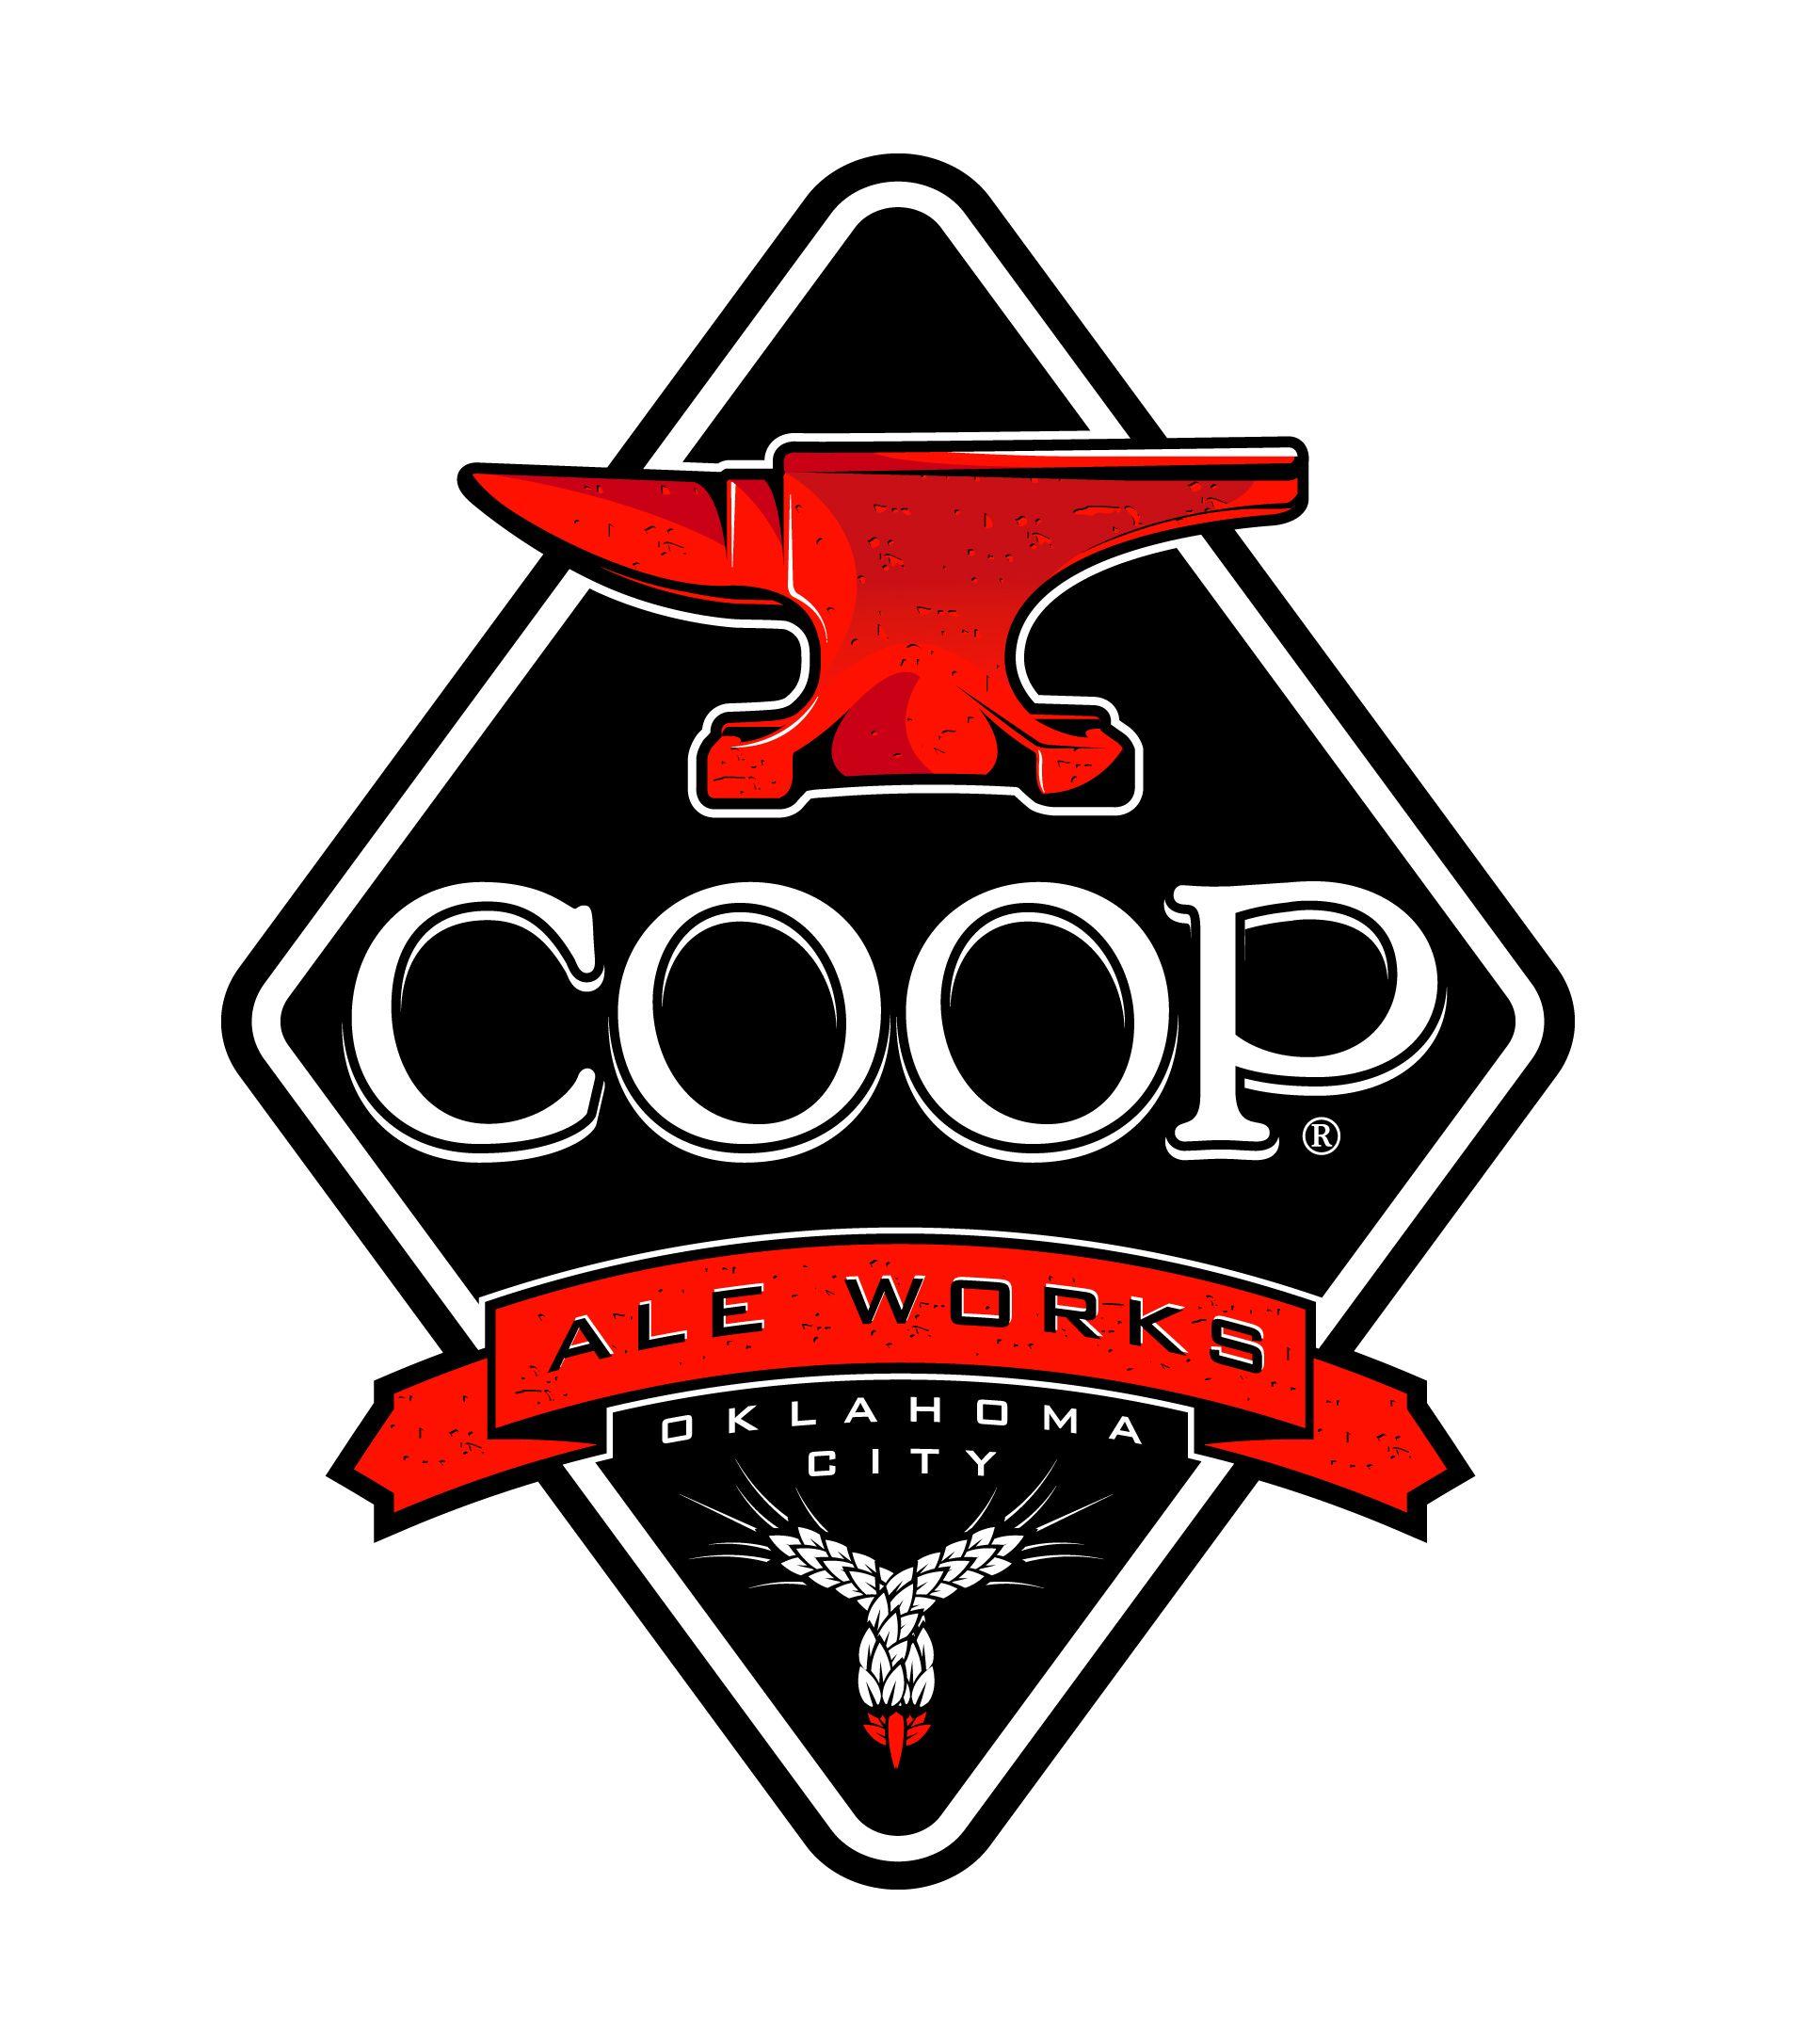 Beer Provided By Okc S Own Coop Ale Works Craft Beer Beer Guide Craft Beer Brewing